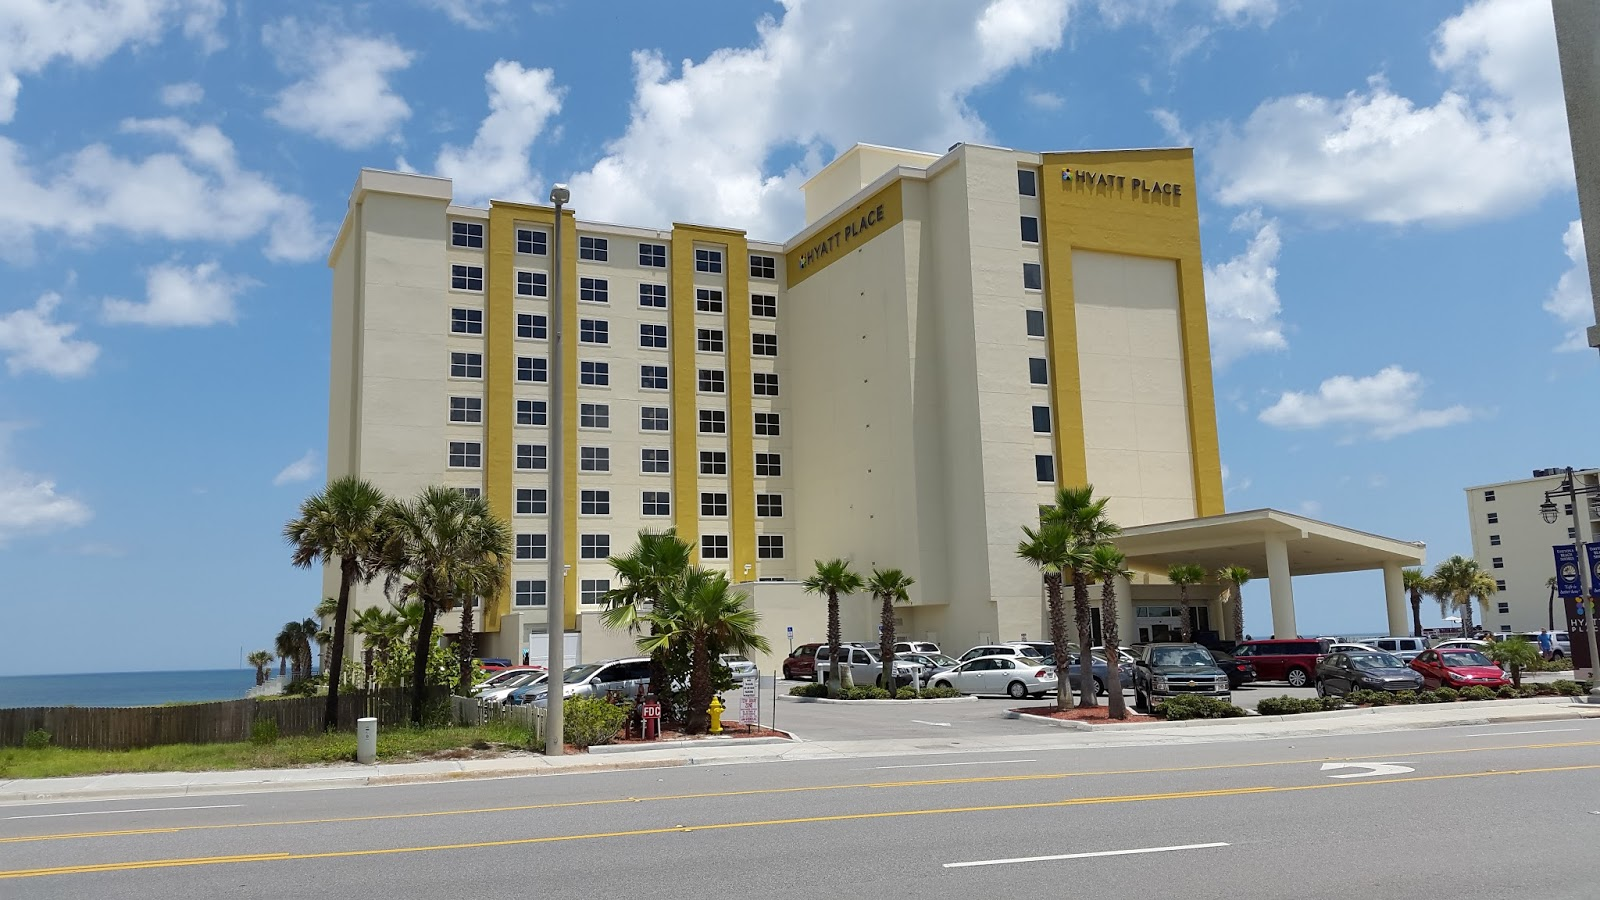 Daytona Beach Parking Permit